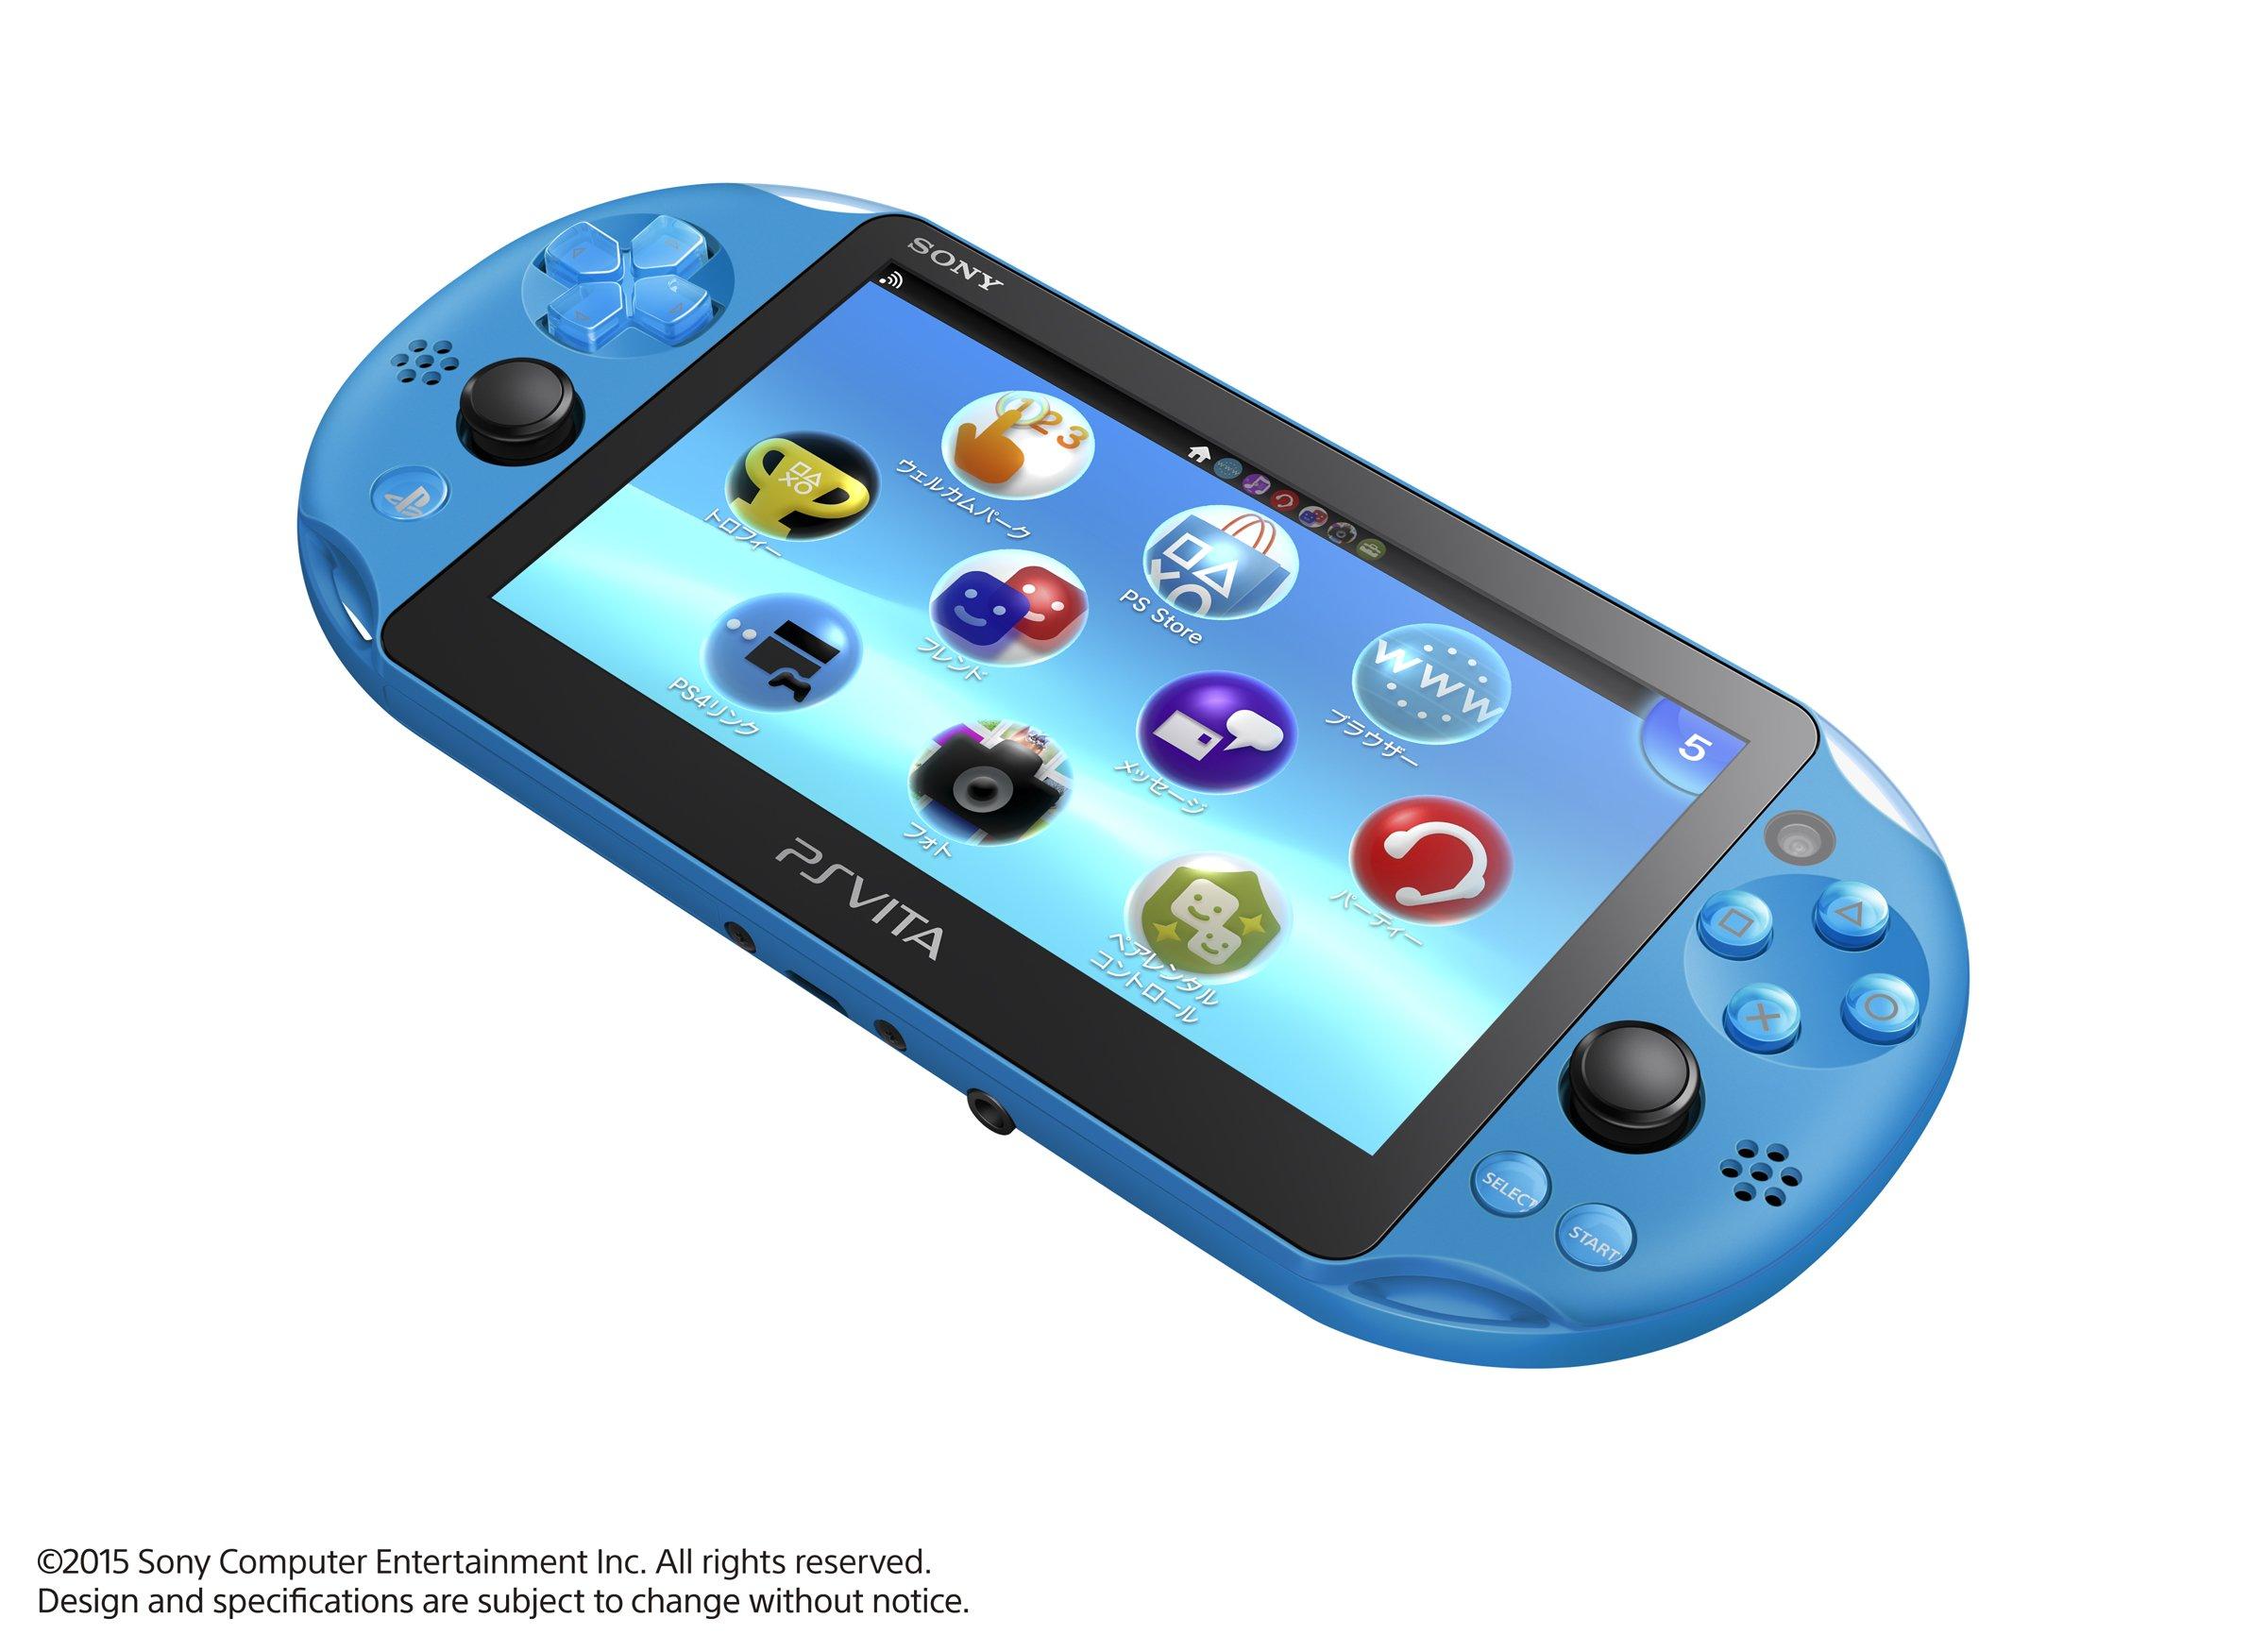 PlayStation Vita Wi-Fi model Aqua Blue (PCH-2000ZA23) Japanese Ver. Japan Import by Sony (Image #2)